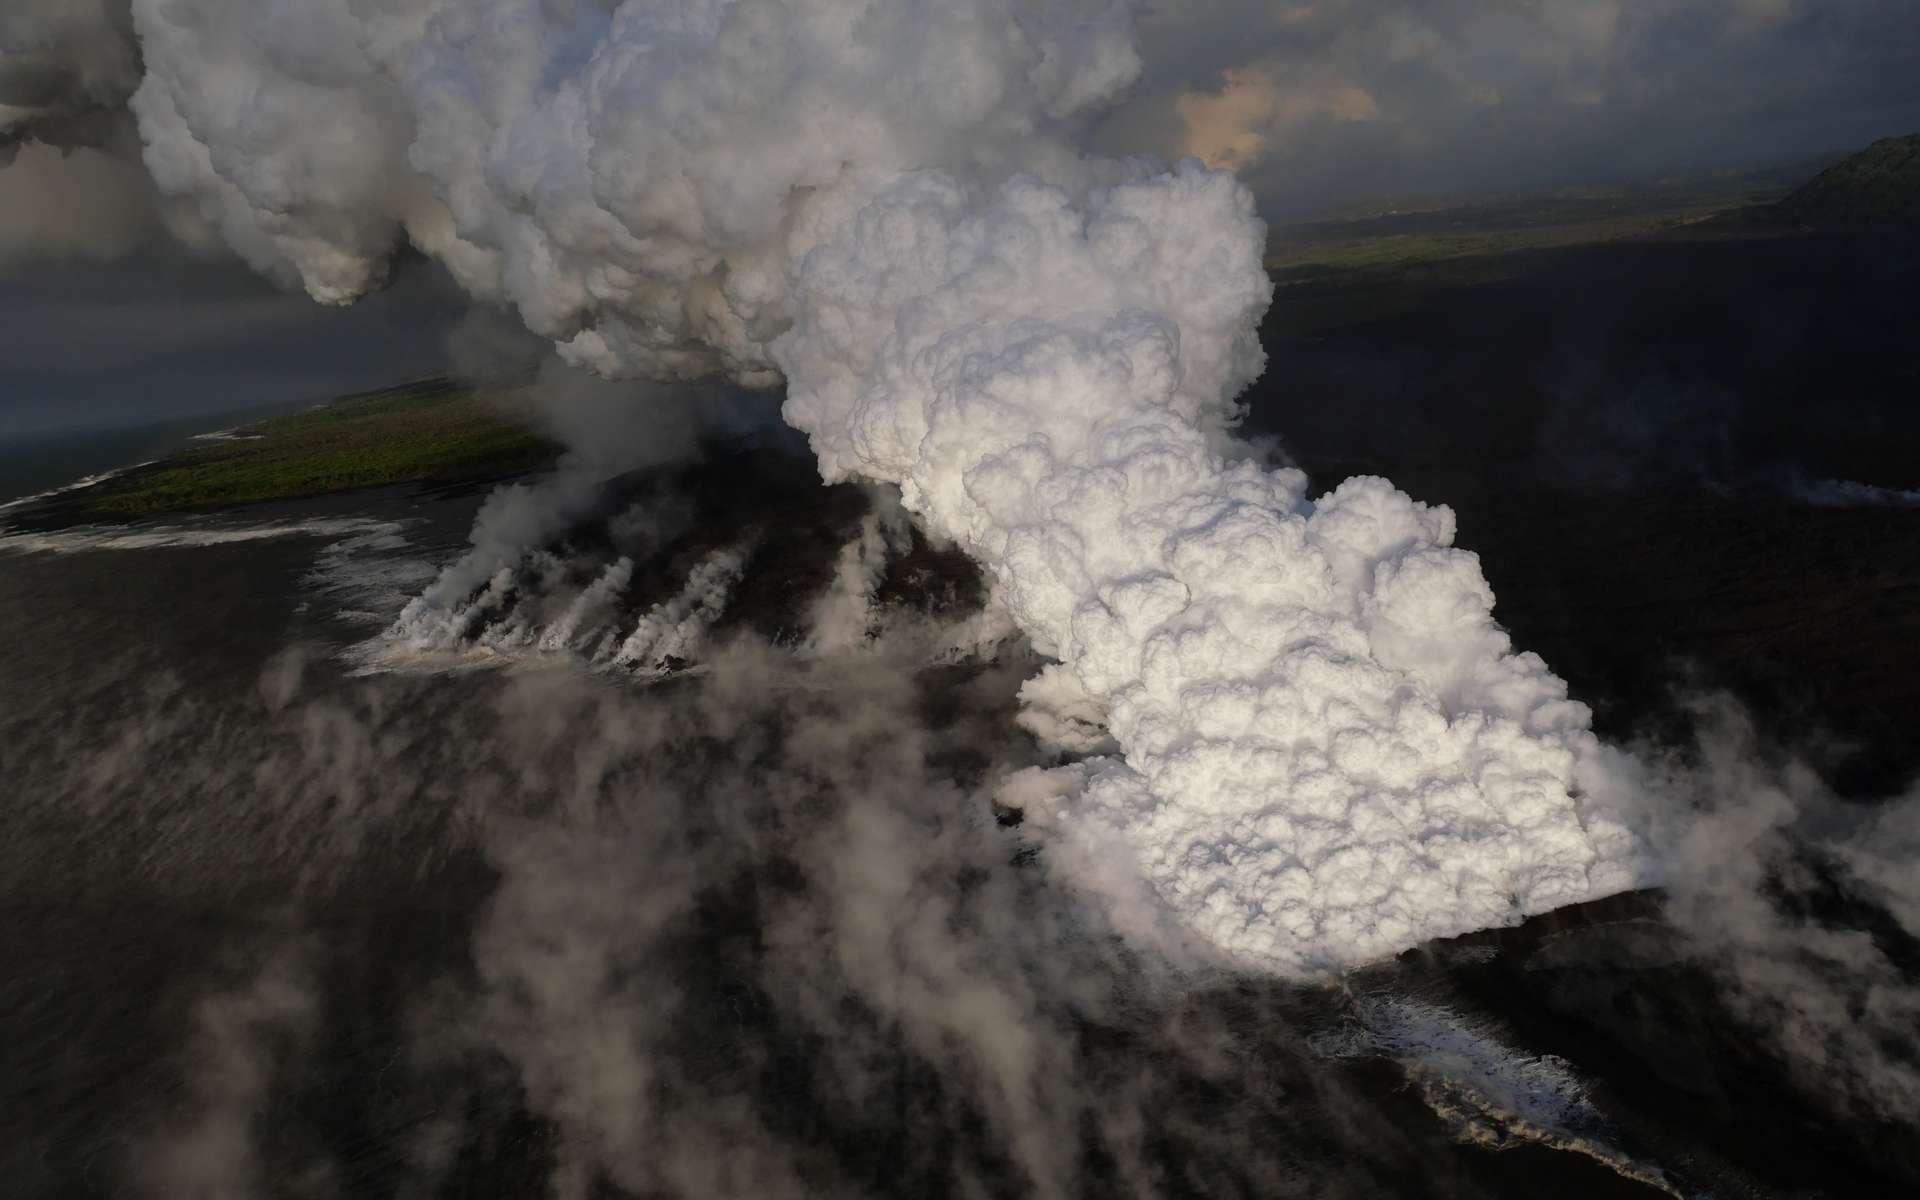 L'éruption du volcan Kīlauea en 2018 à Hawaï. © USGS